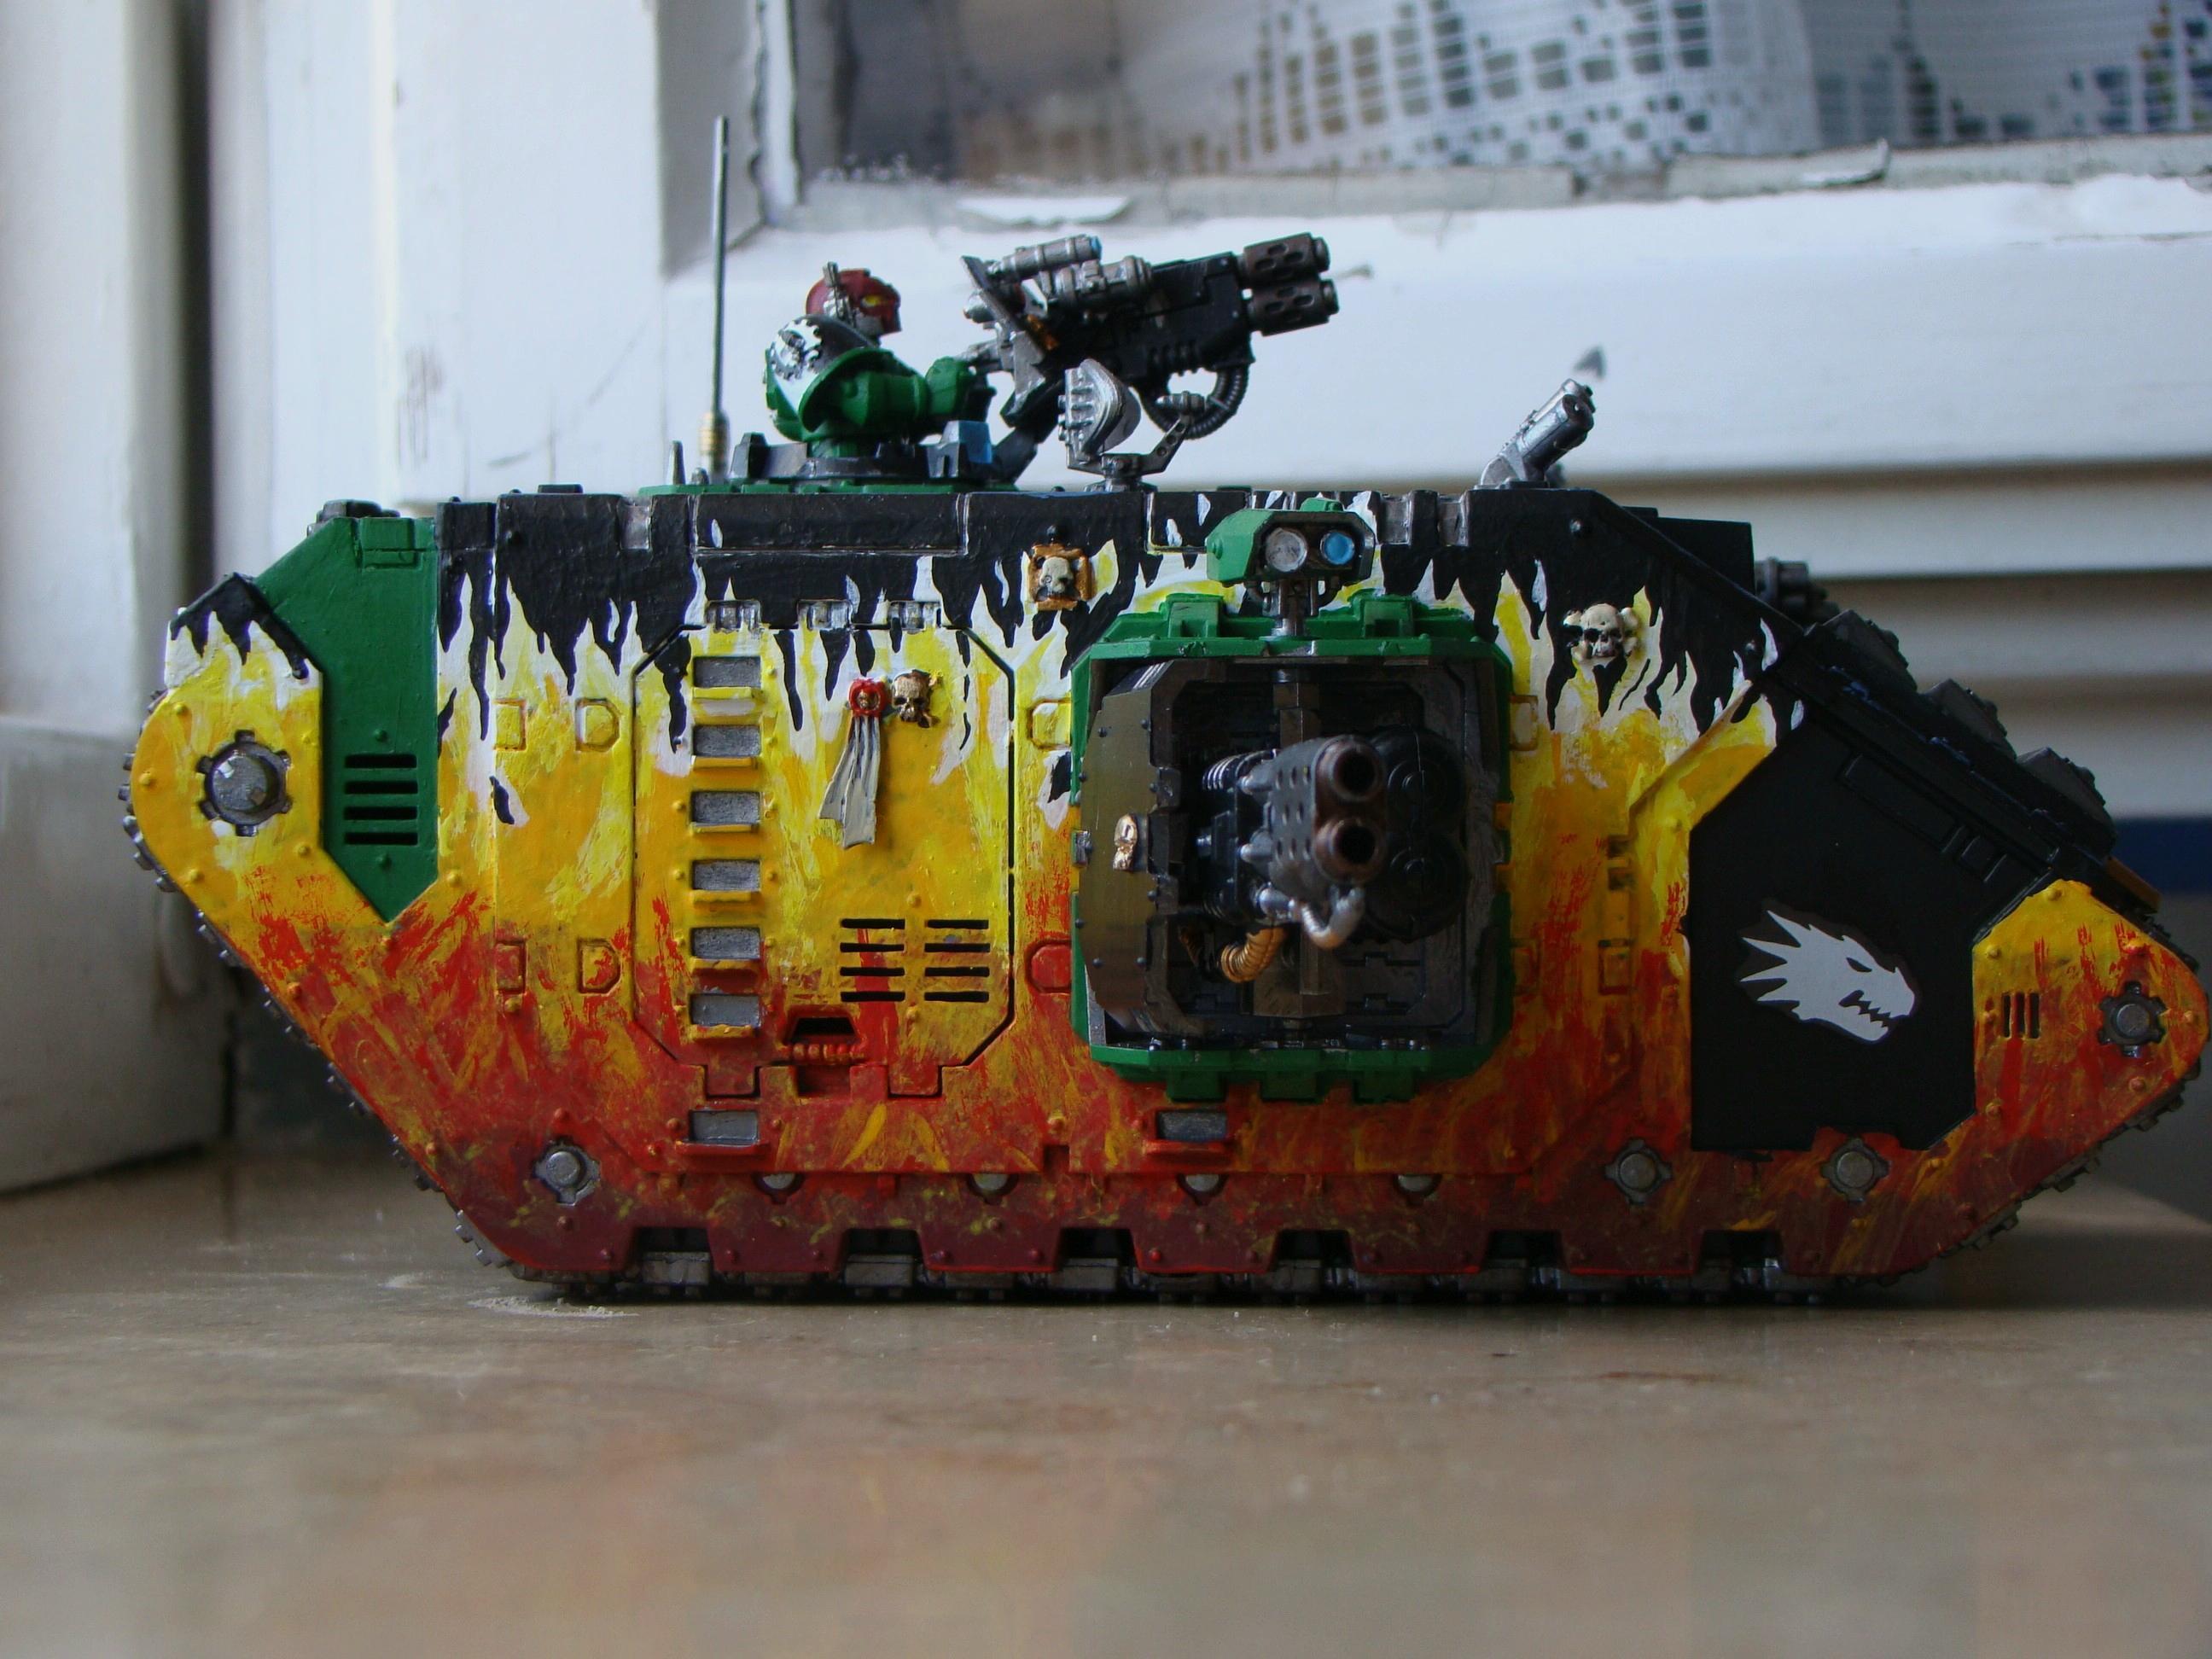 Land Raider, Salamanders, Space Marines, Warhammer 40,000